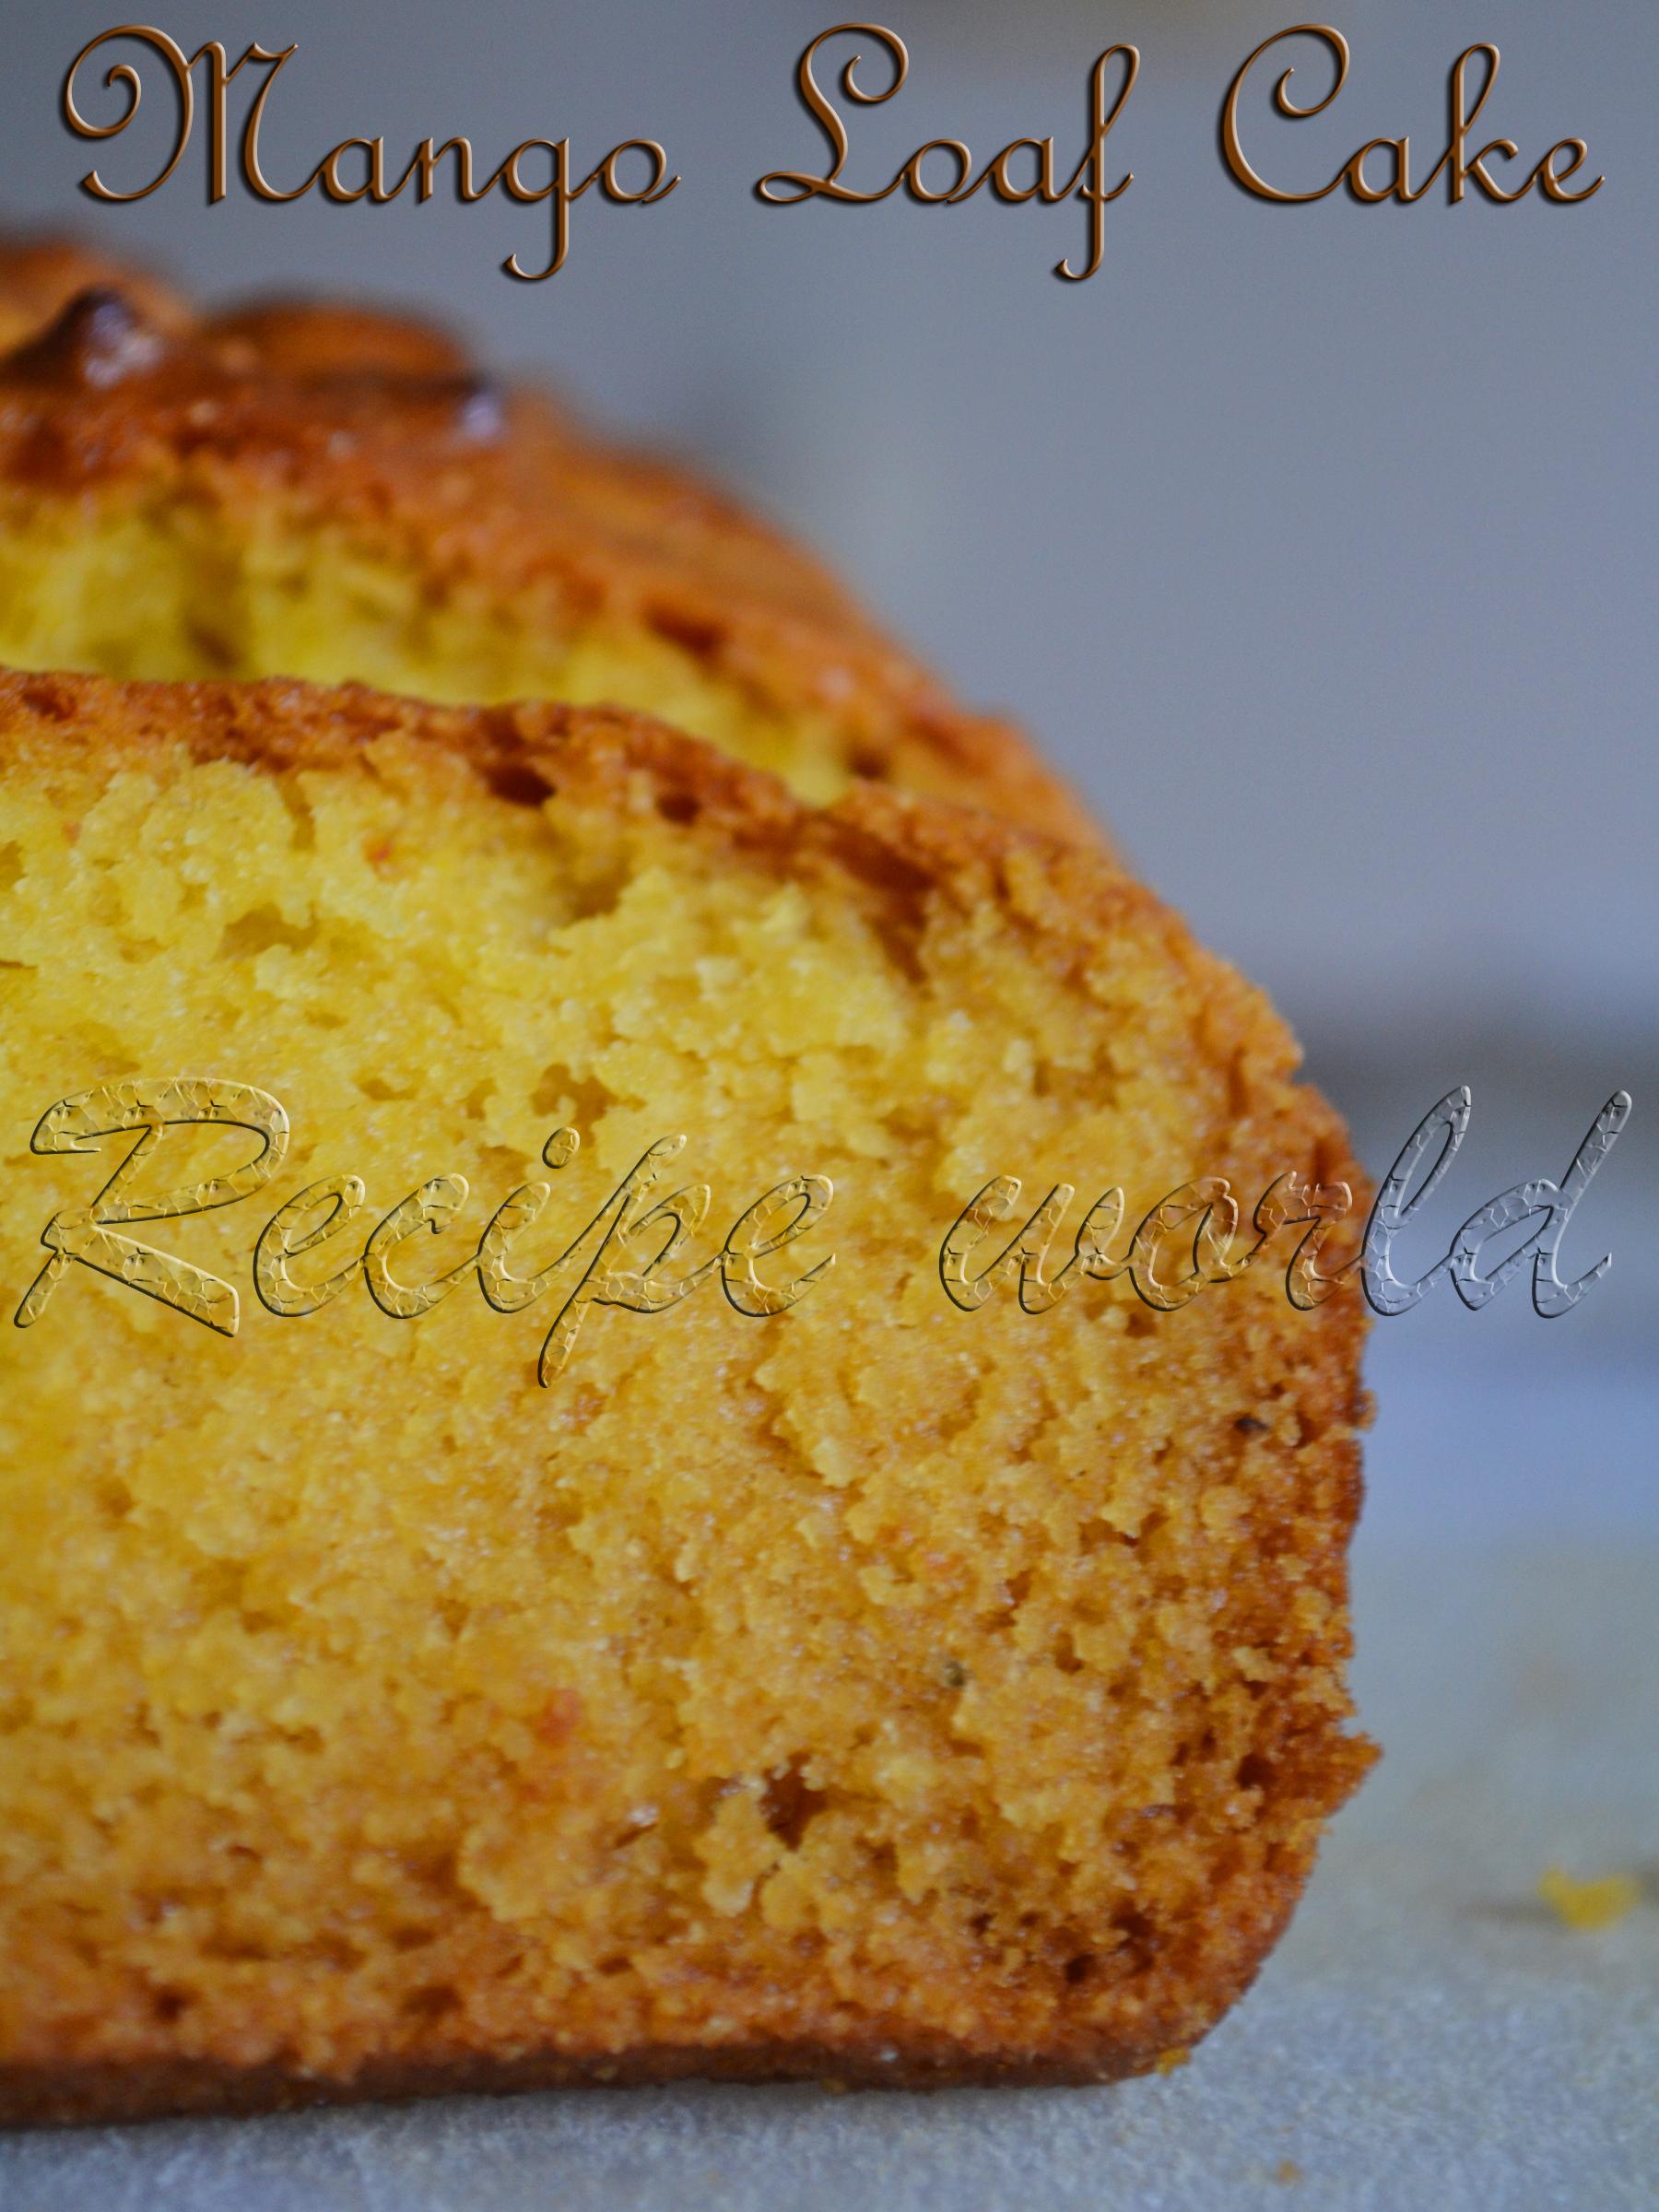 Egg-less Mango Loaf Cake | Egg-less Mango Bread